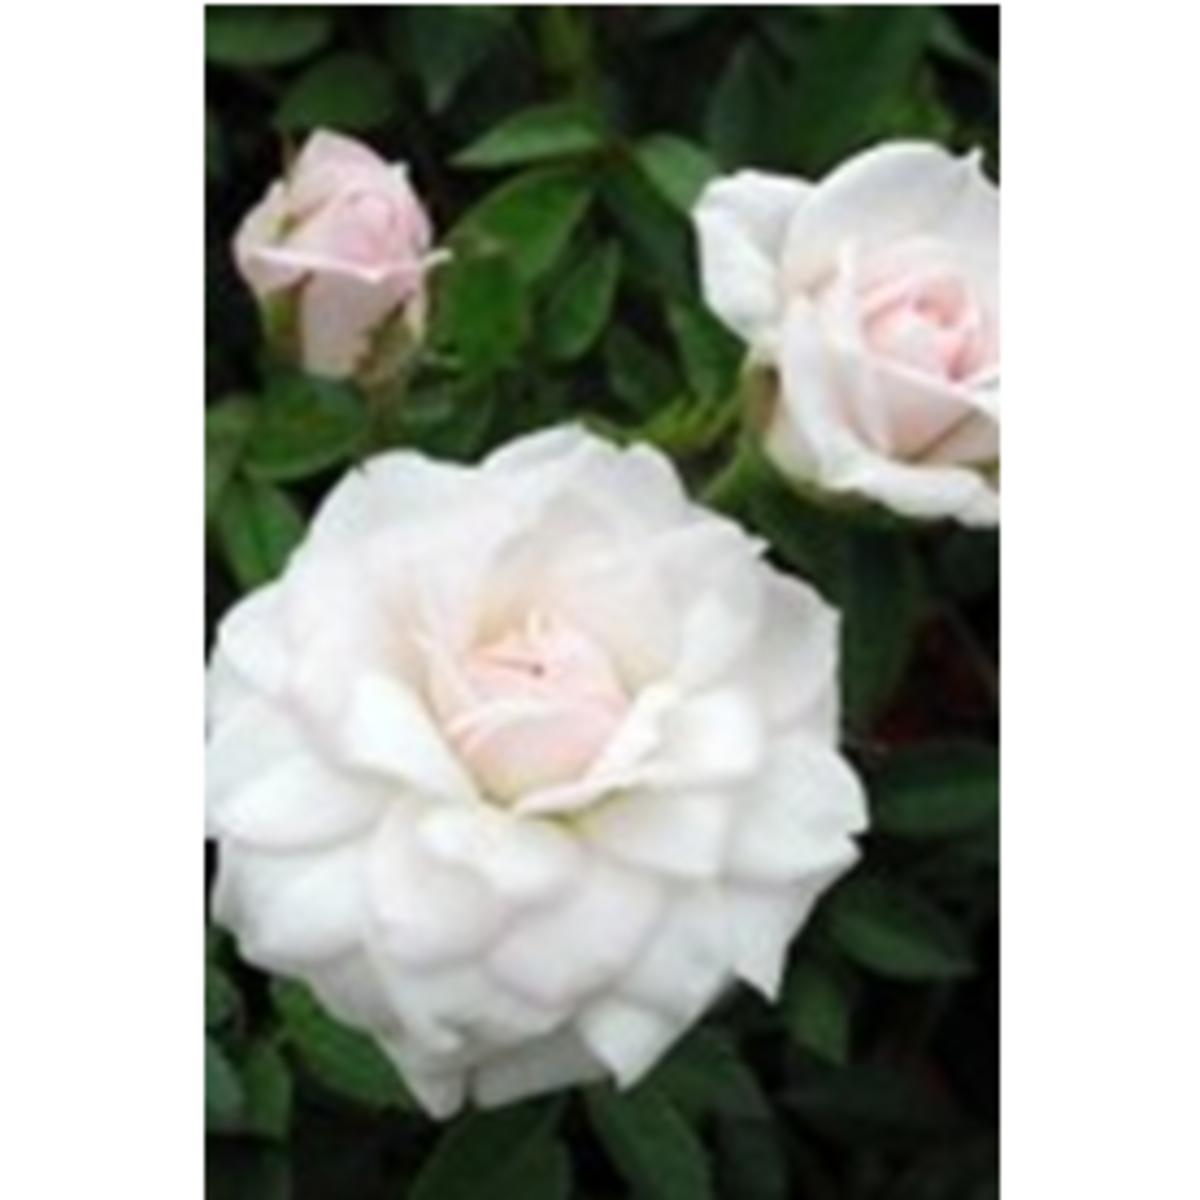 Miniature White Roses Photo